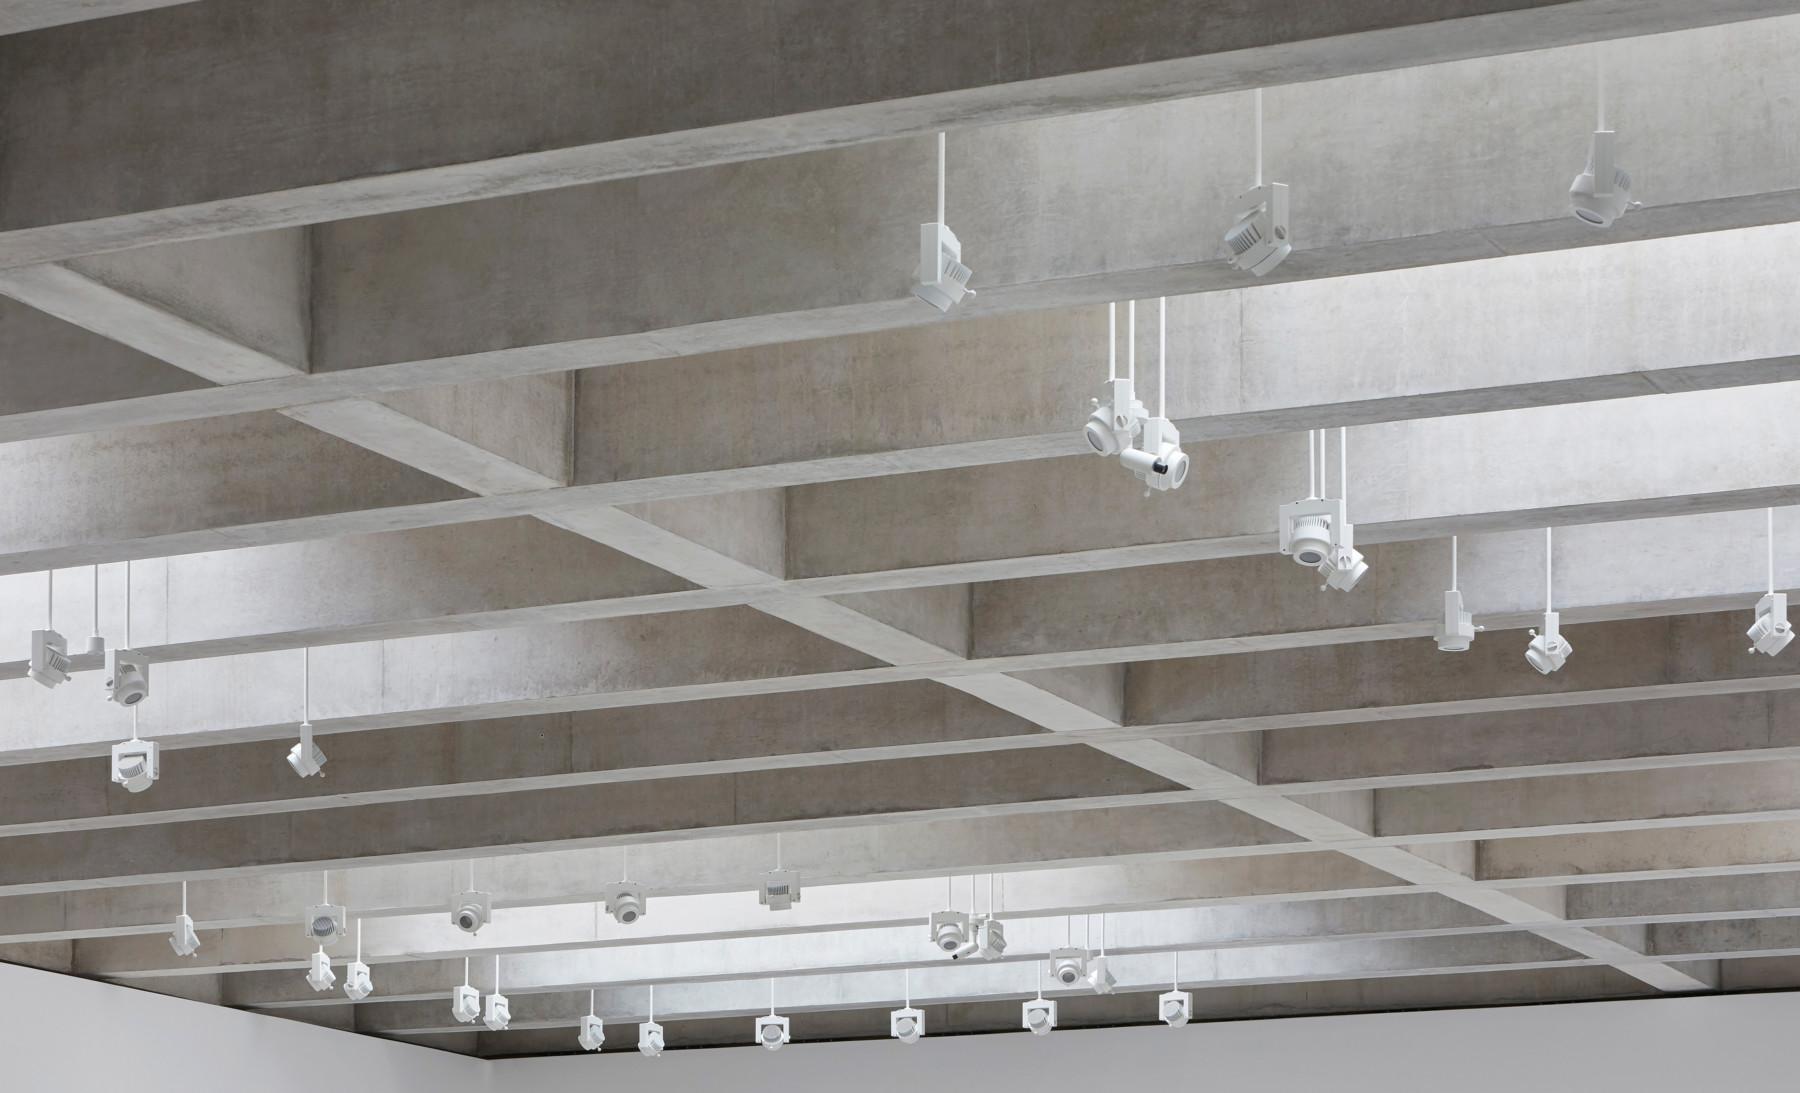 Tate Modern St Ives